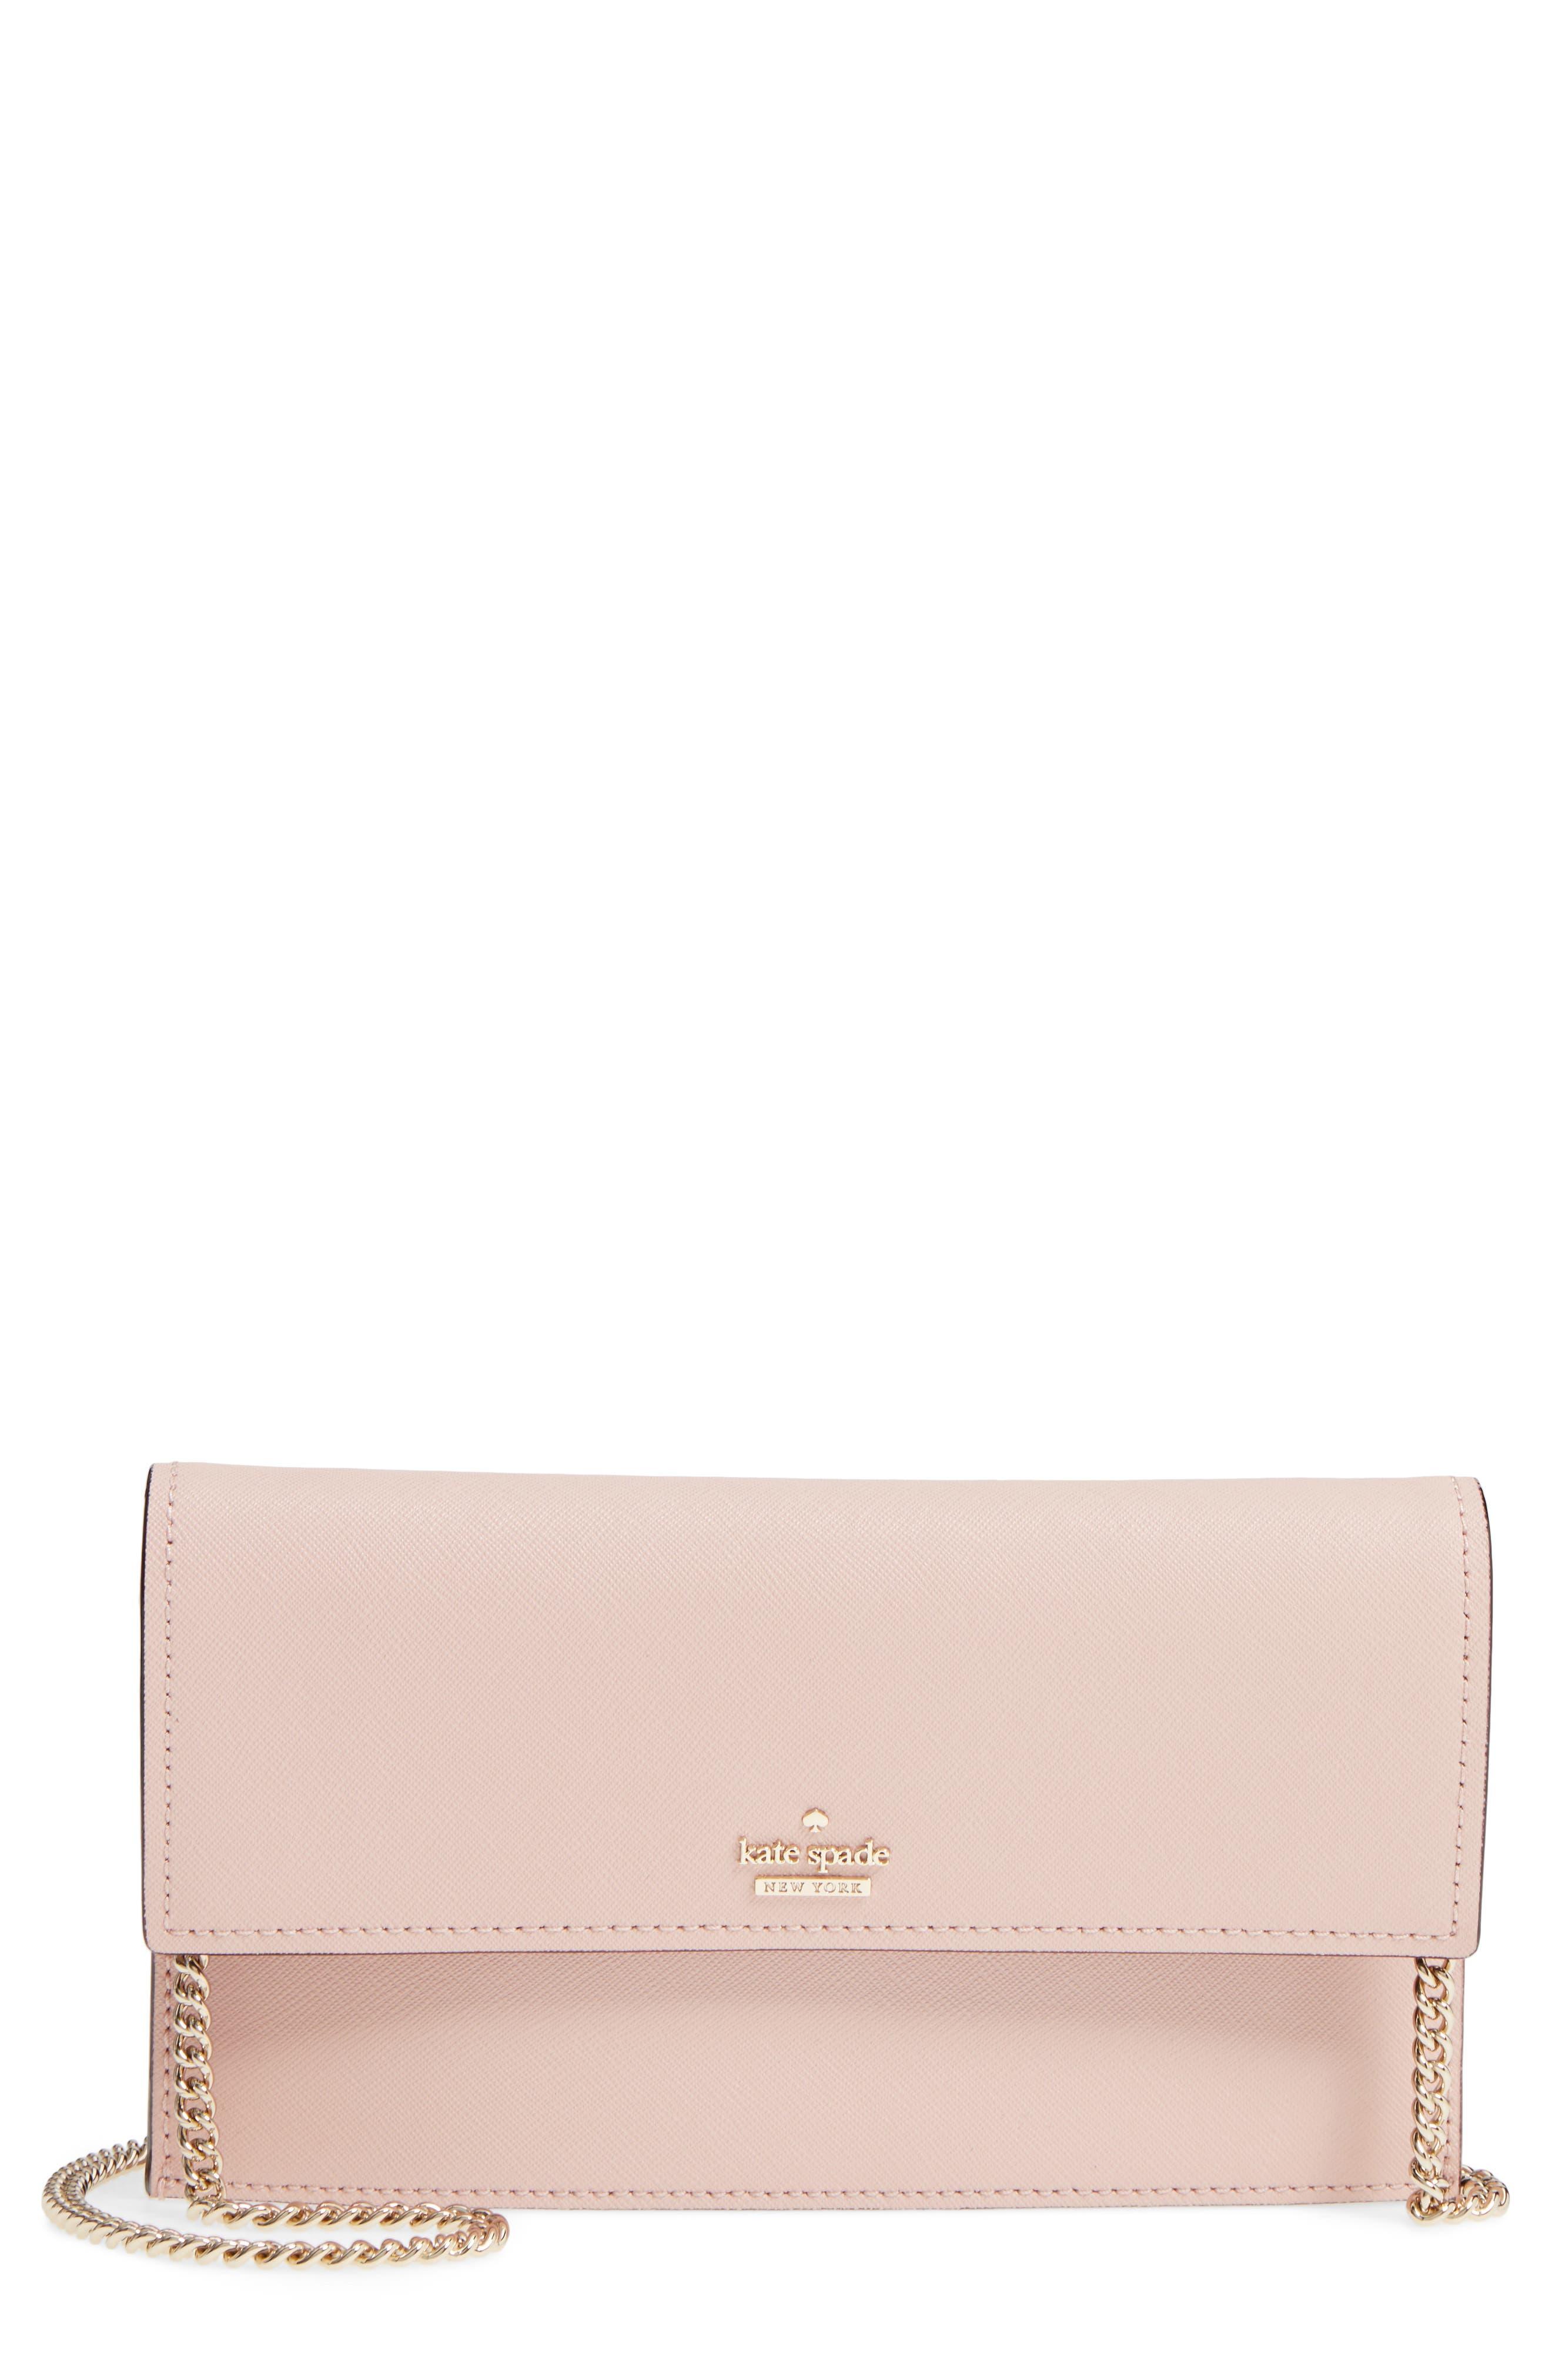 cameron street - brennan leather wallet & card case,                             Main thumbnail 1, color,                             Warm Vellum